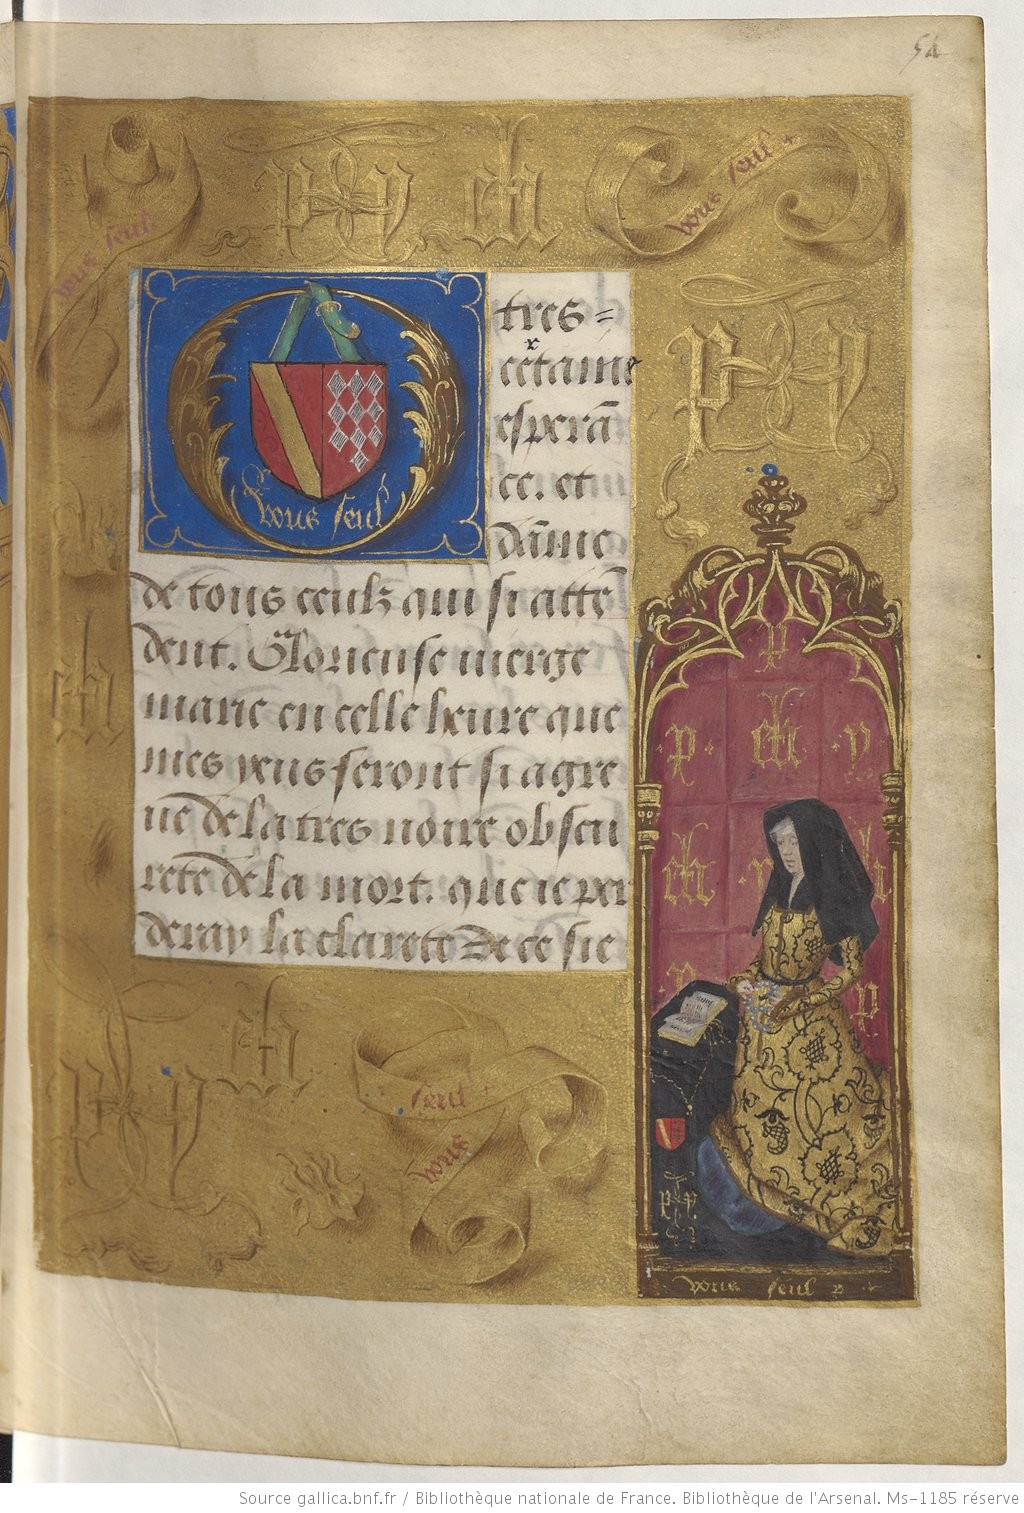 1490-96 Heures de Boussu, BNF Arsenal. Ms-1185 reserve fol 54r Gallica